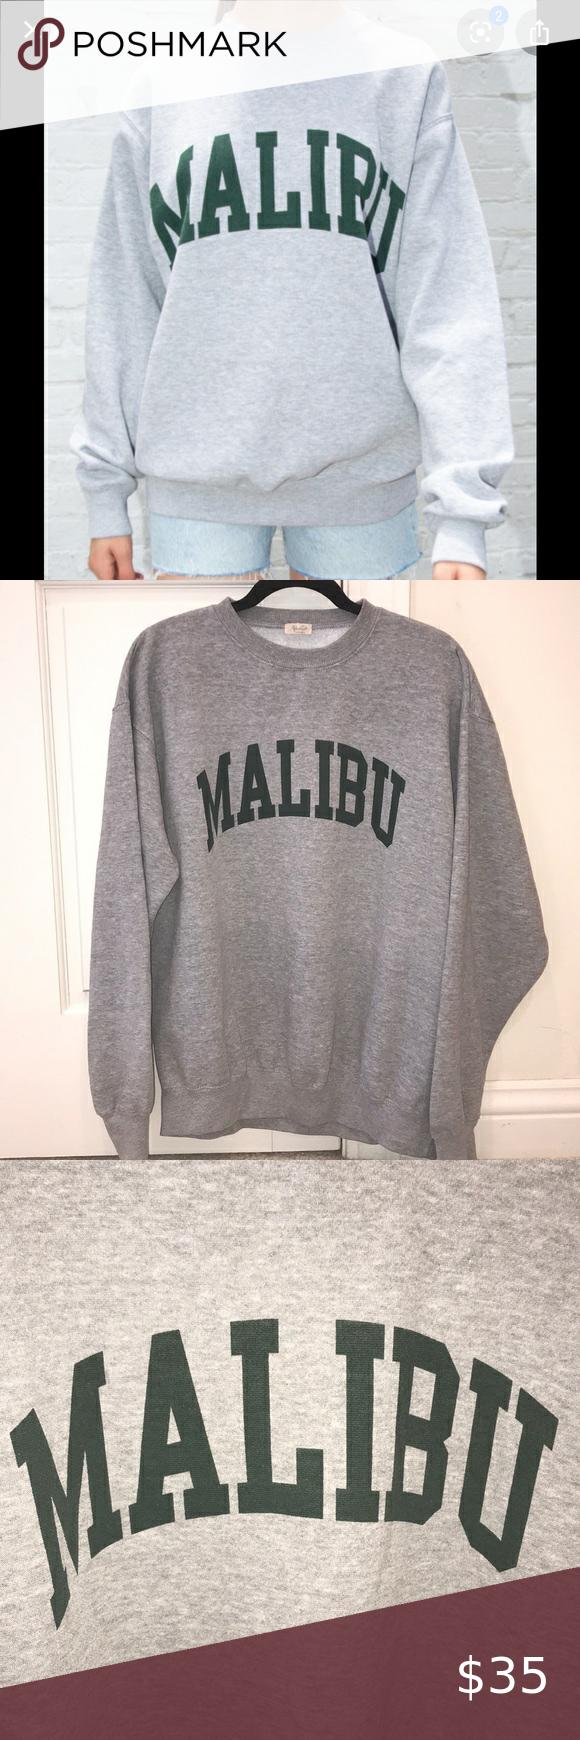 Brandy Melville Malibu Erica Crewneck Sweatshirt Sweatshirts Crew Neck Sweatshirt Brandy Melville [ 1740 x 580 Pixel ]